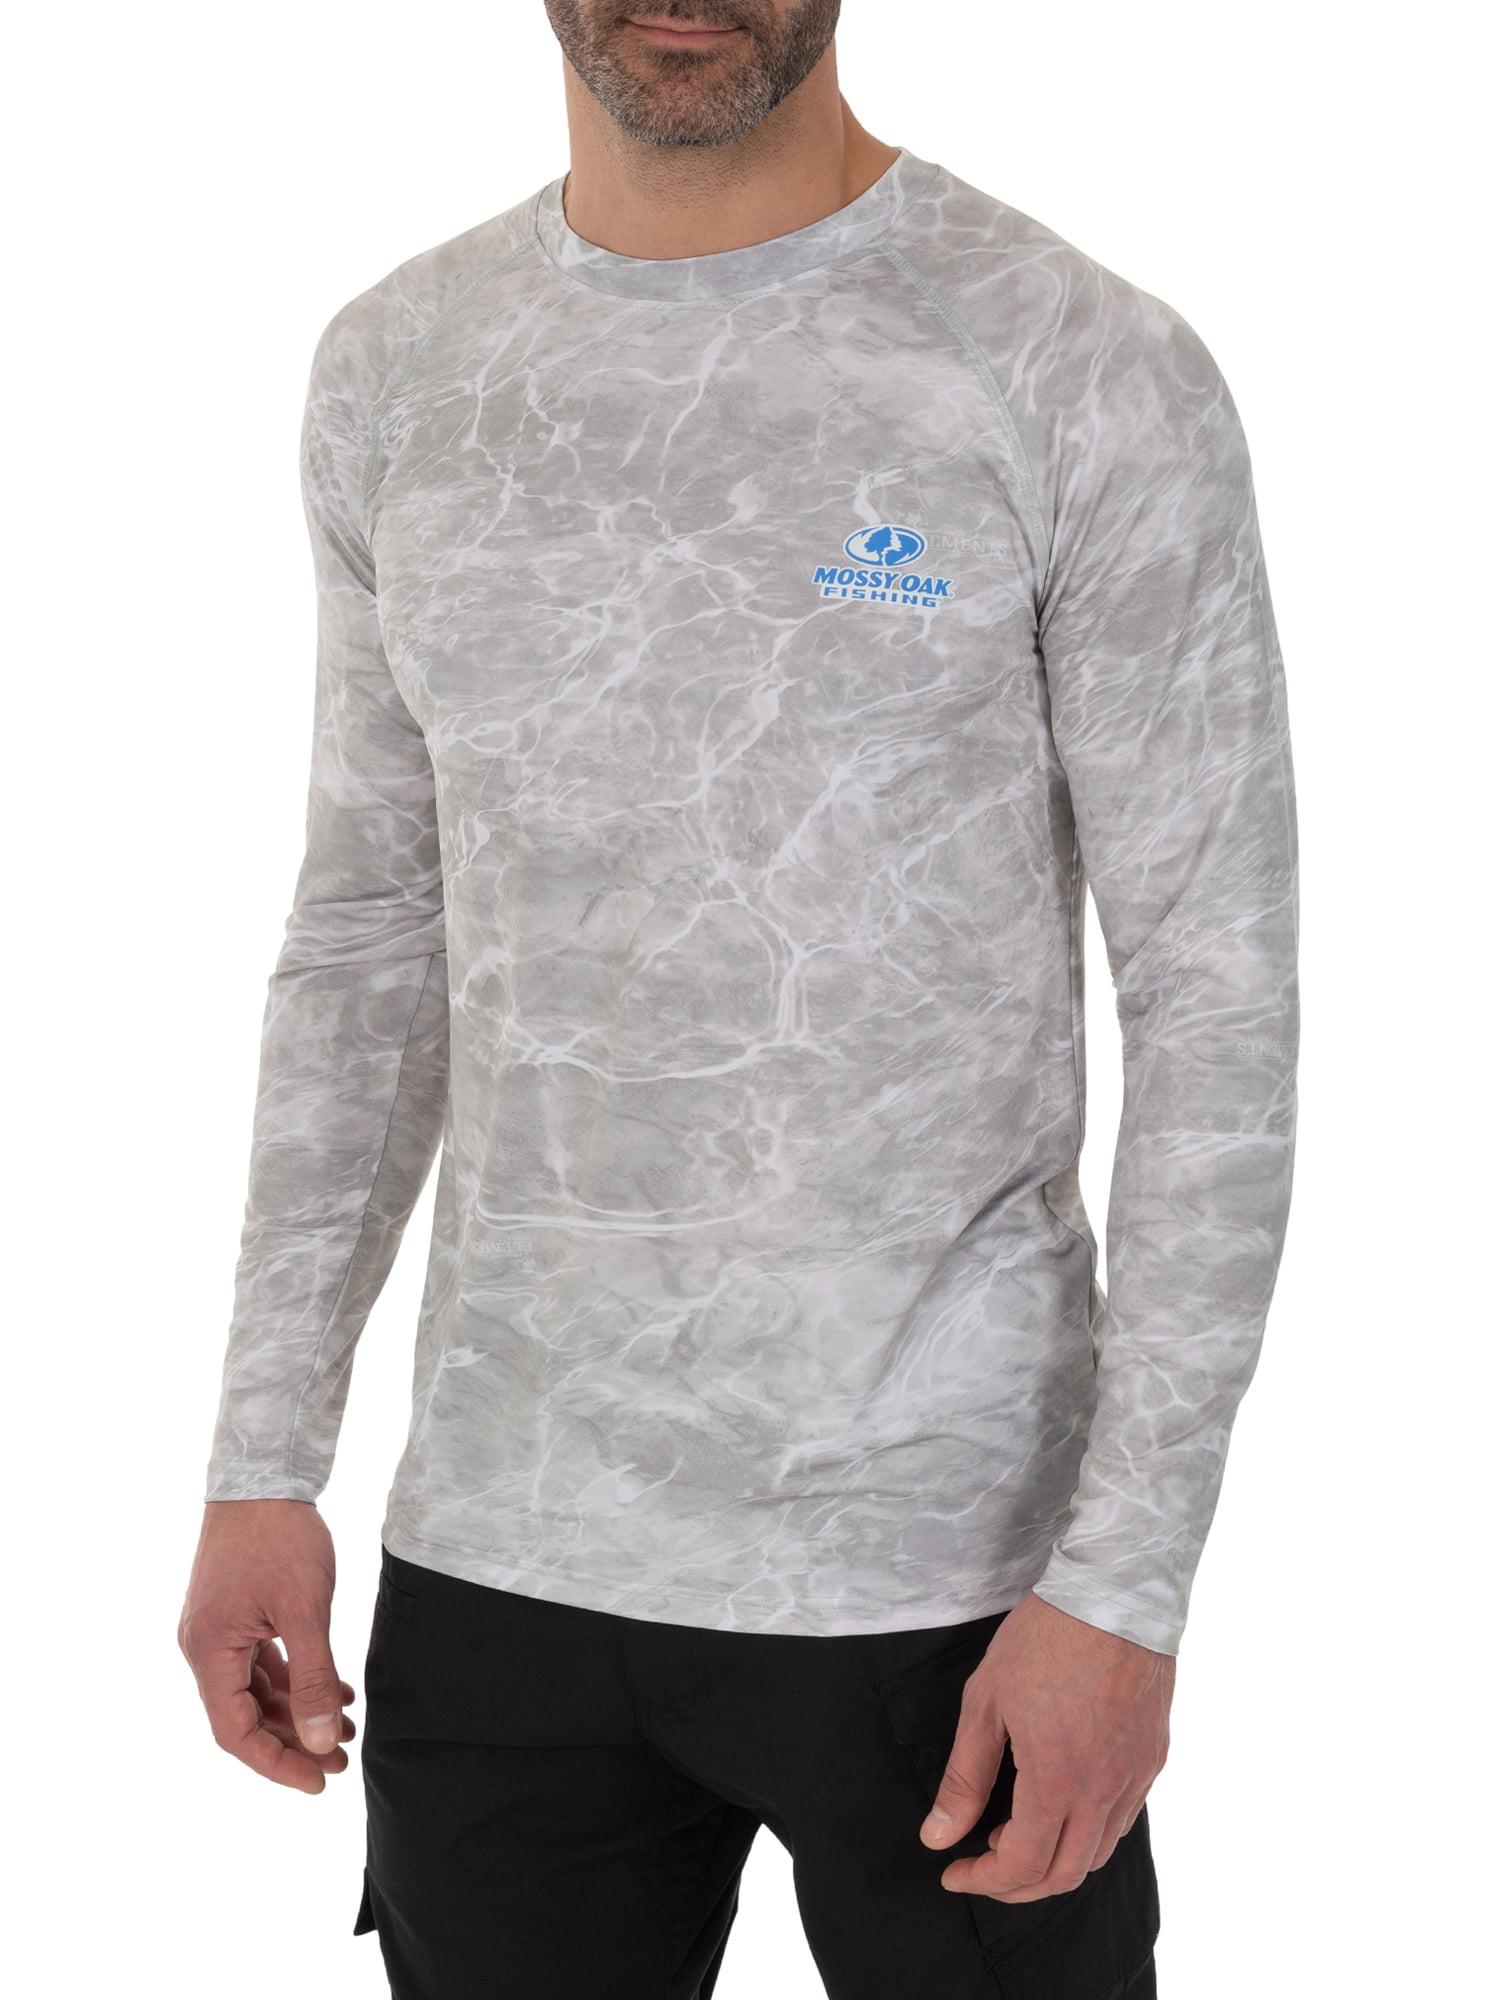 Men/'s Mossy Oak I Love Camo White Baseball Raglan T-Shirt Outdoors Hunting Tee